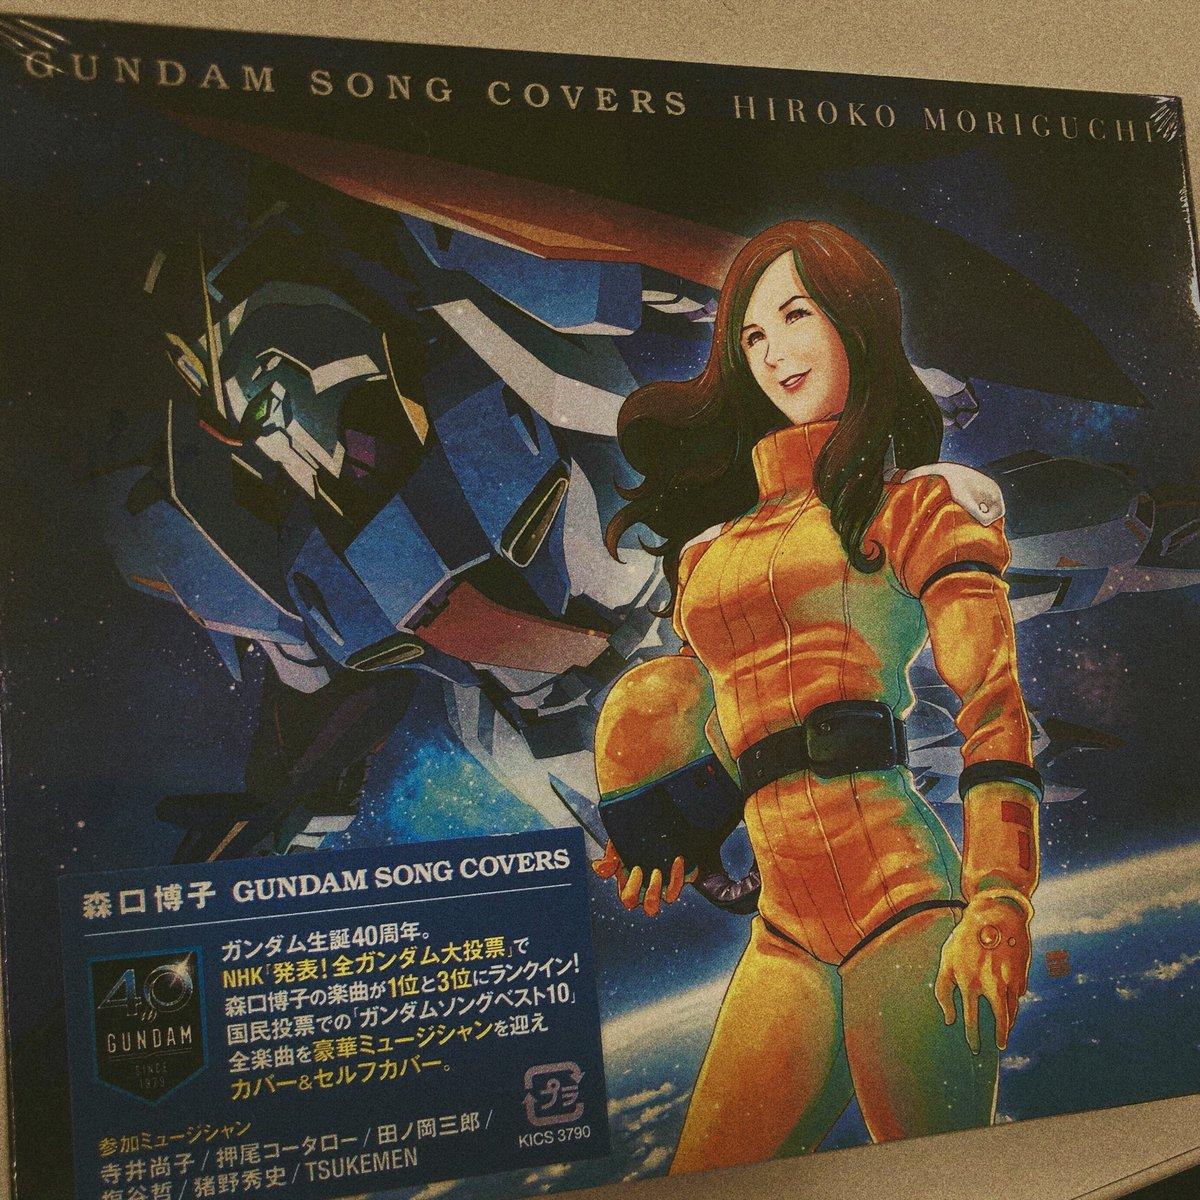 GUNDAM SONG COVERSに関する画像36